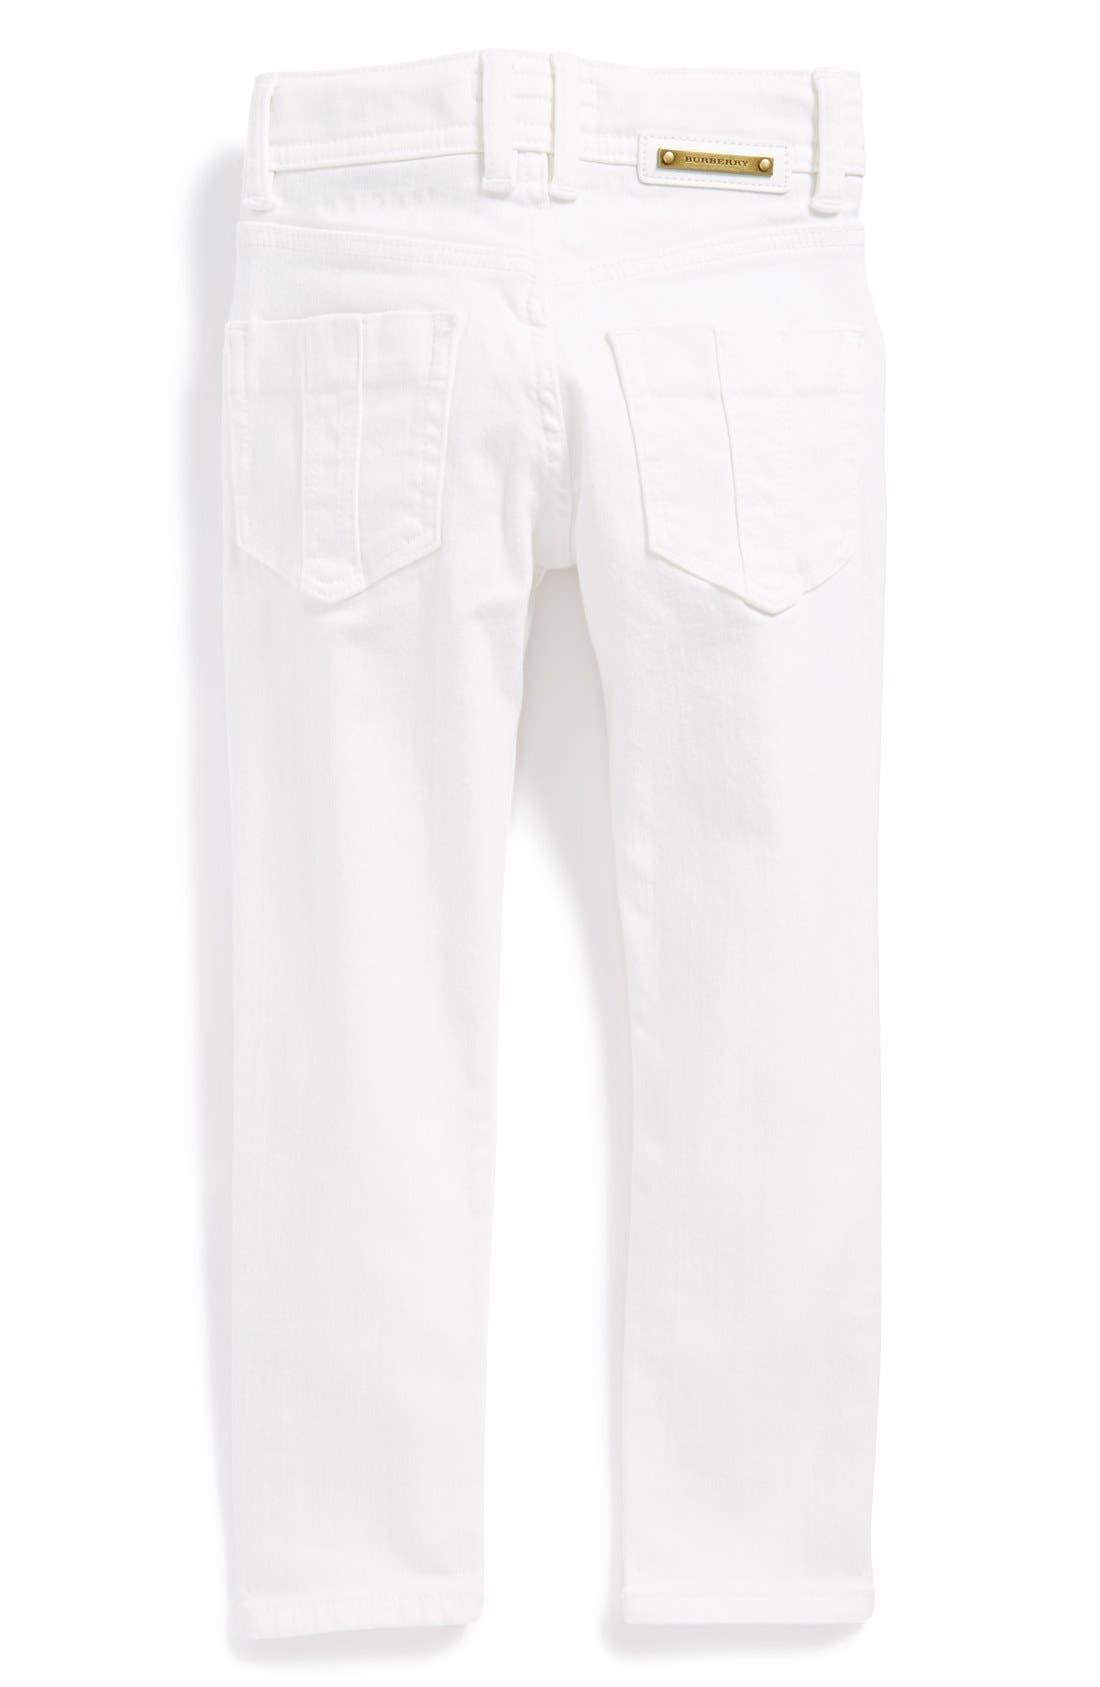 Alternate Image 1 Selected - Burberry 'Piccadilly' Skinny Jeans (Toddler Girls, Little Girls & Big Girls)